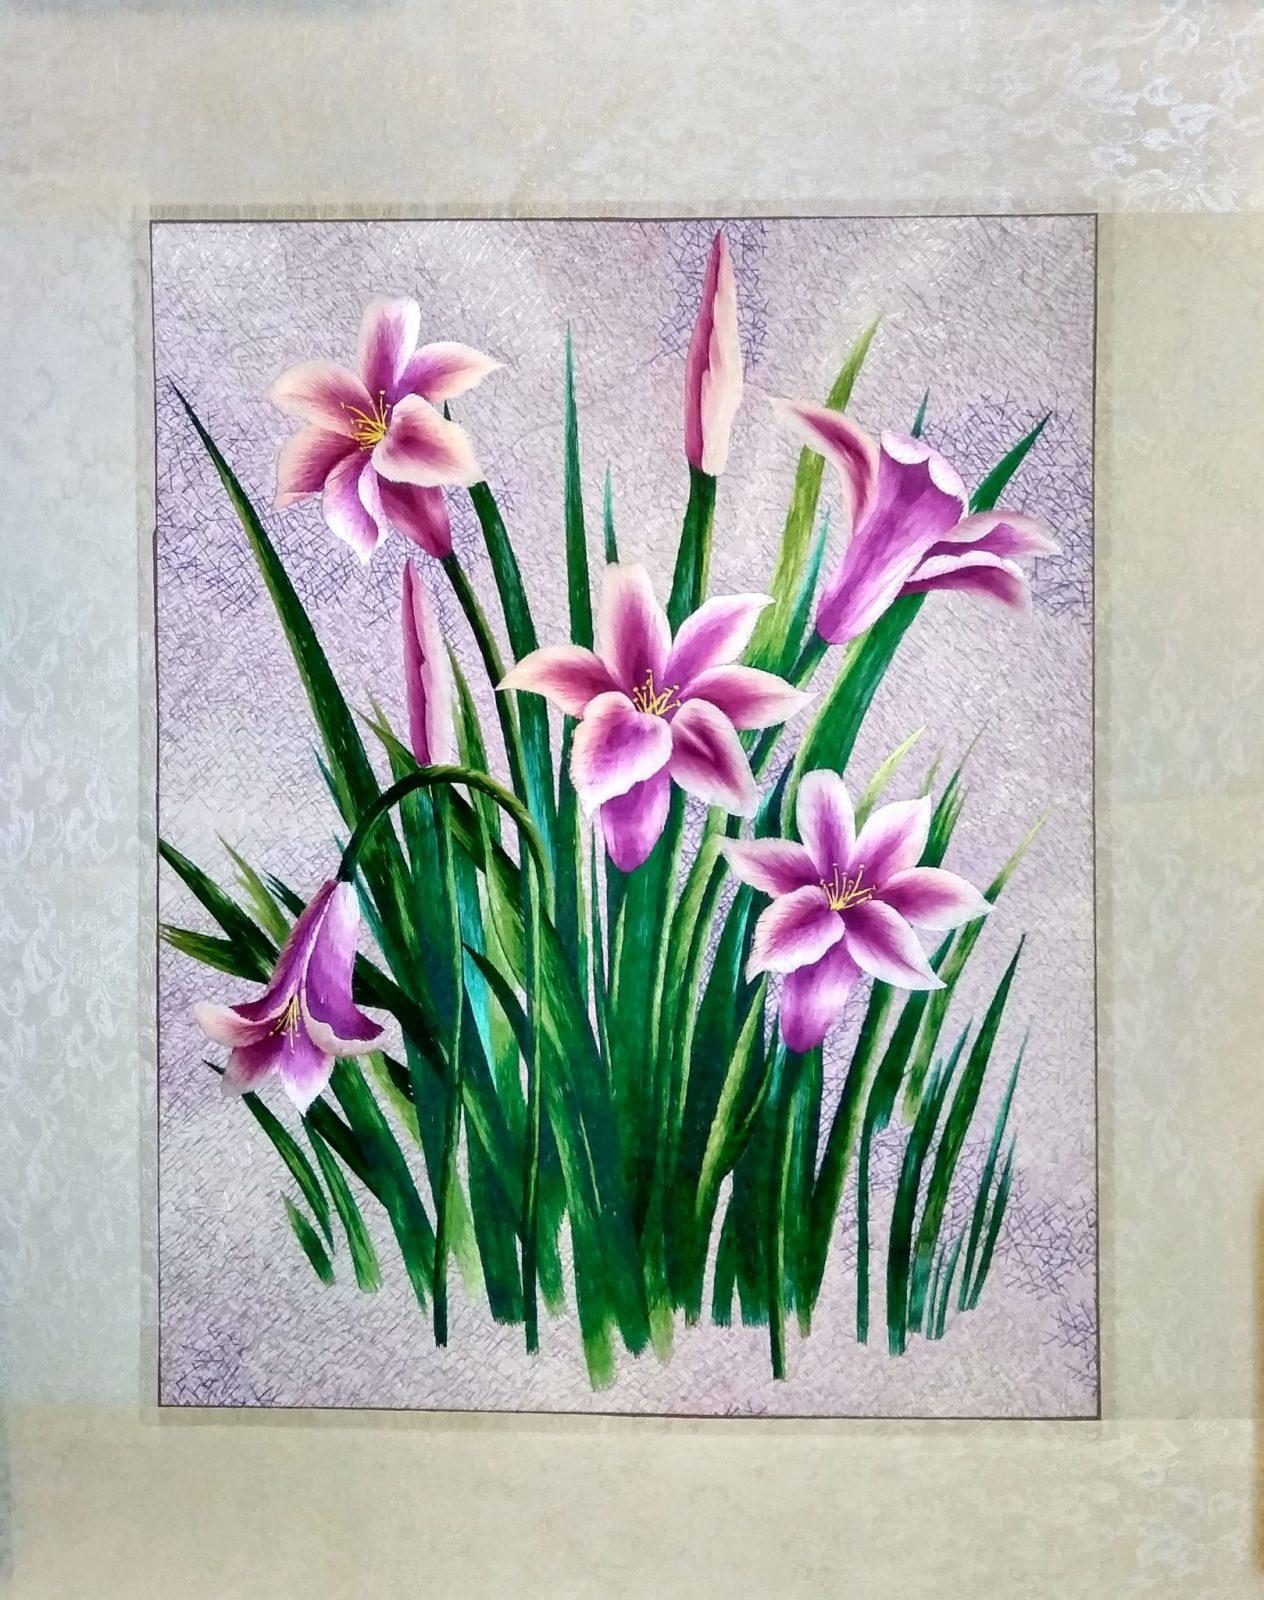 Вышивка шелком 52х66 «Полевые цветы» арт.В11